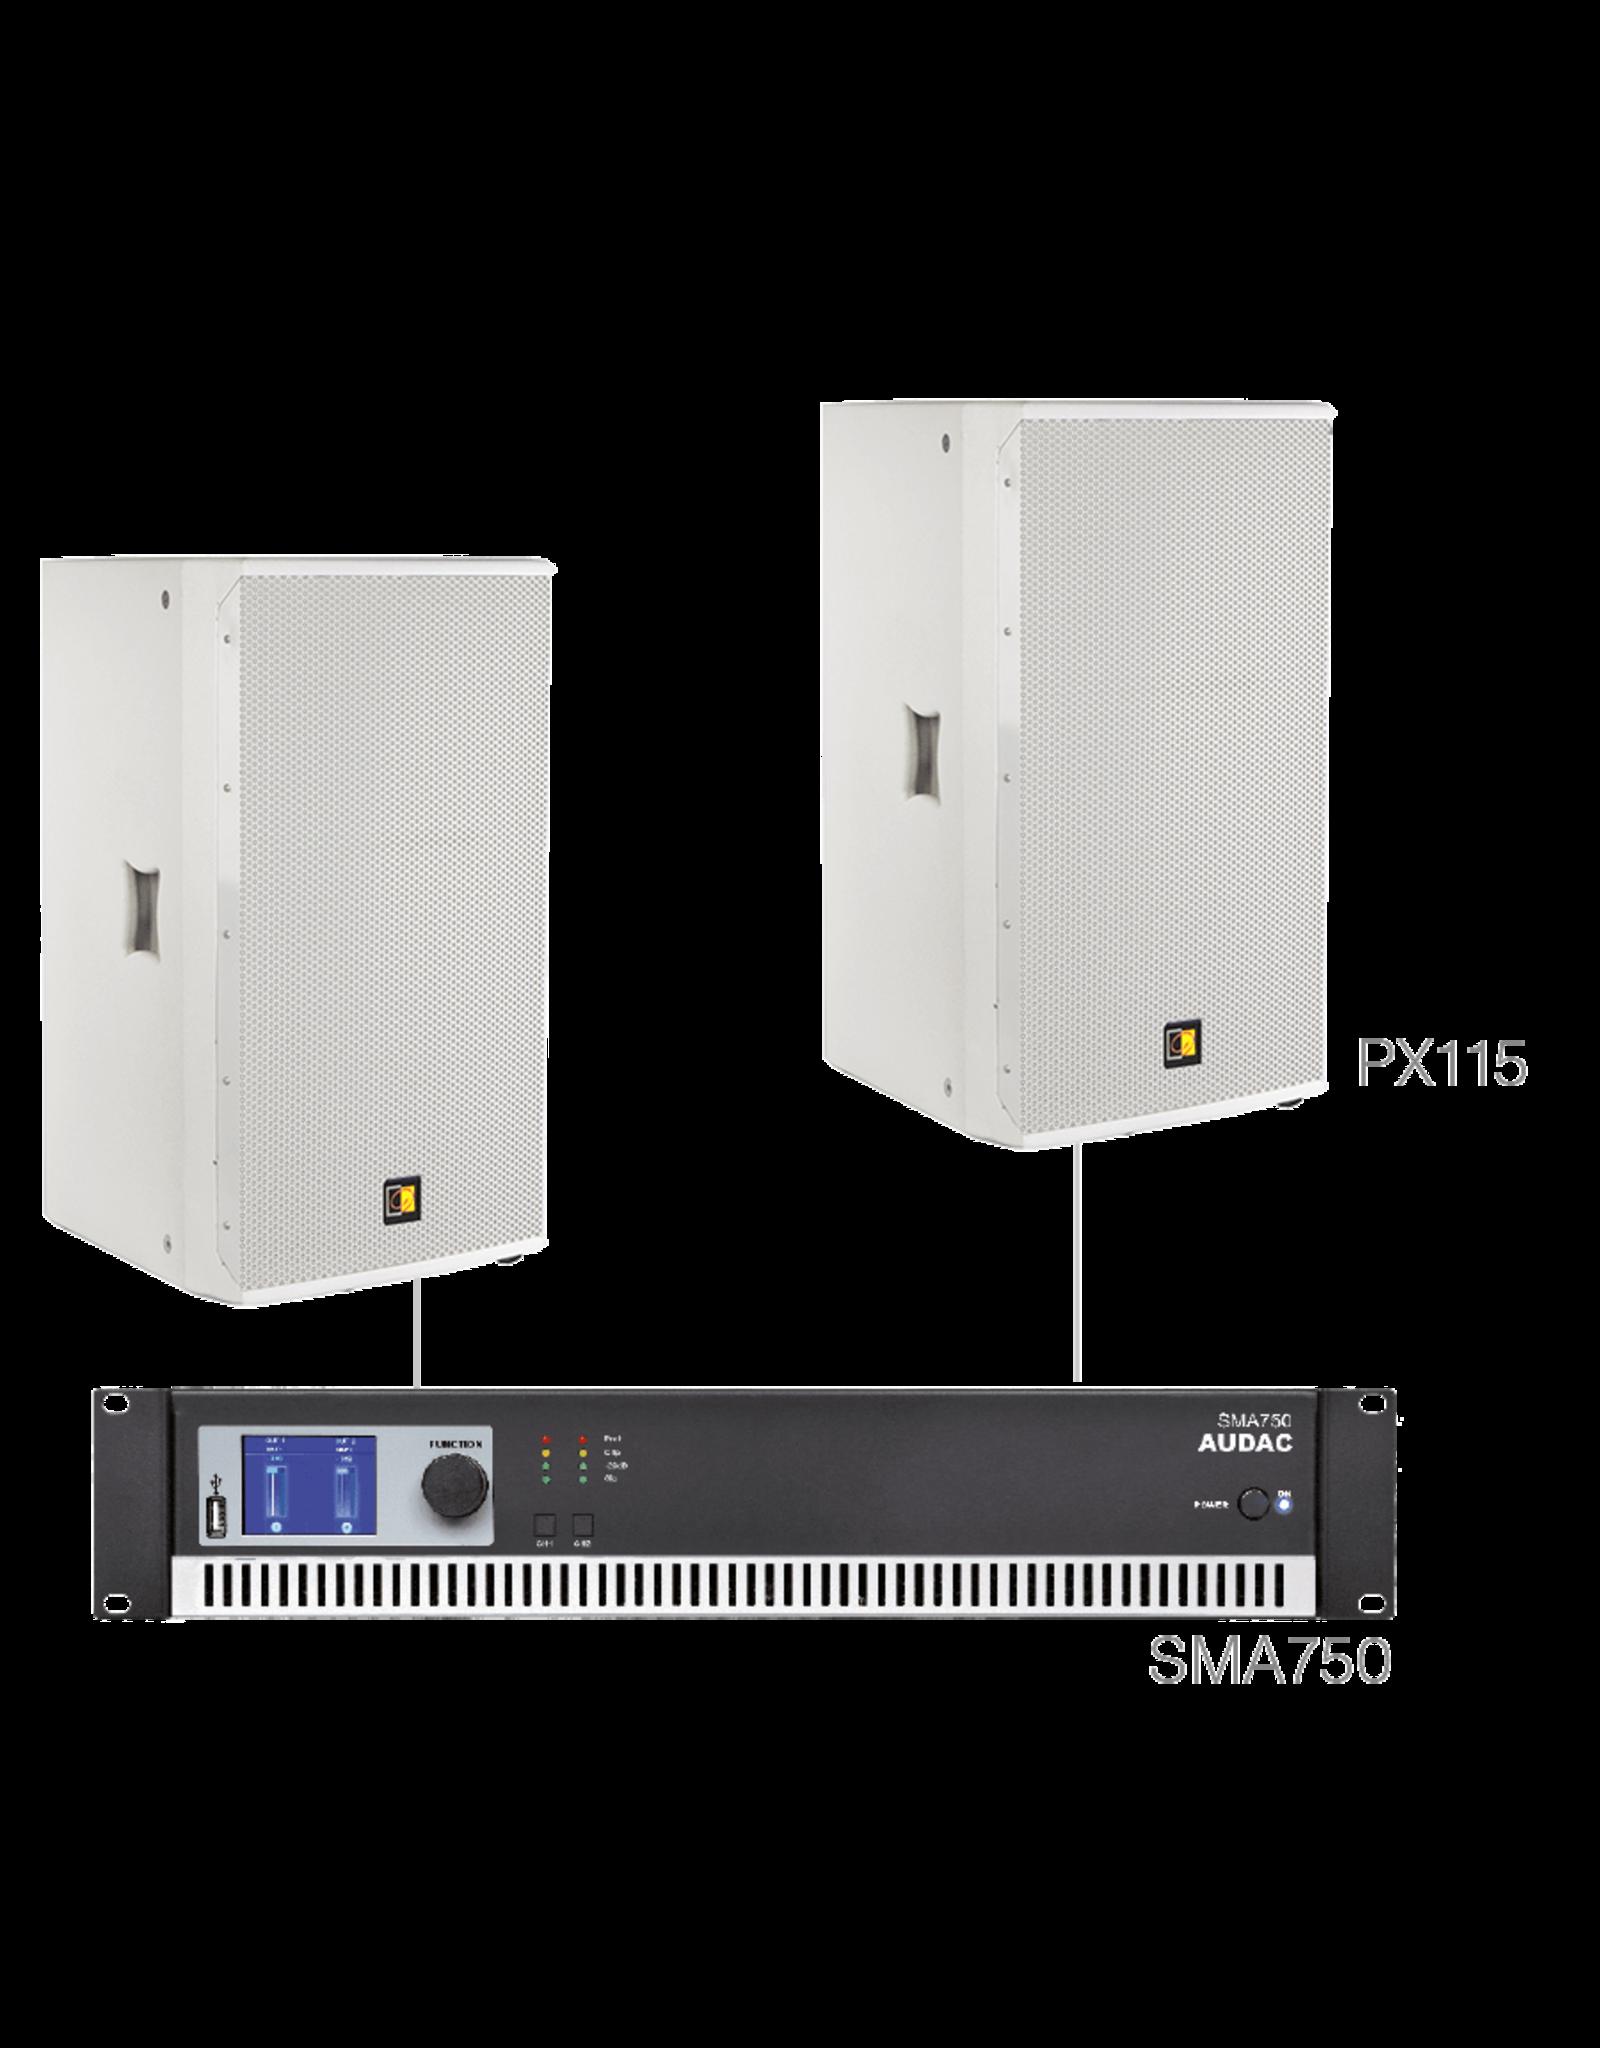 Audac 2 x PX115 + SMA750 White version